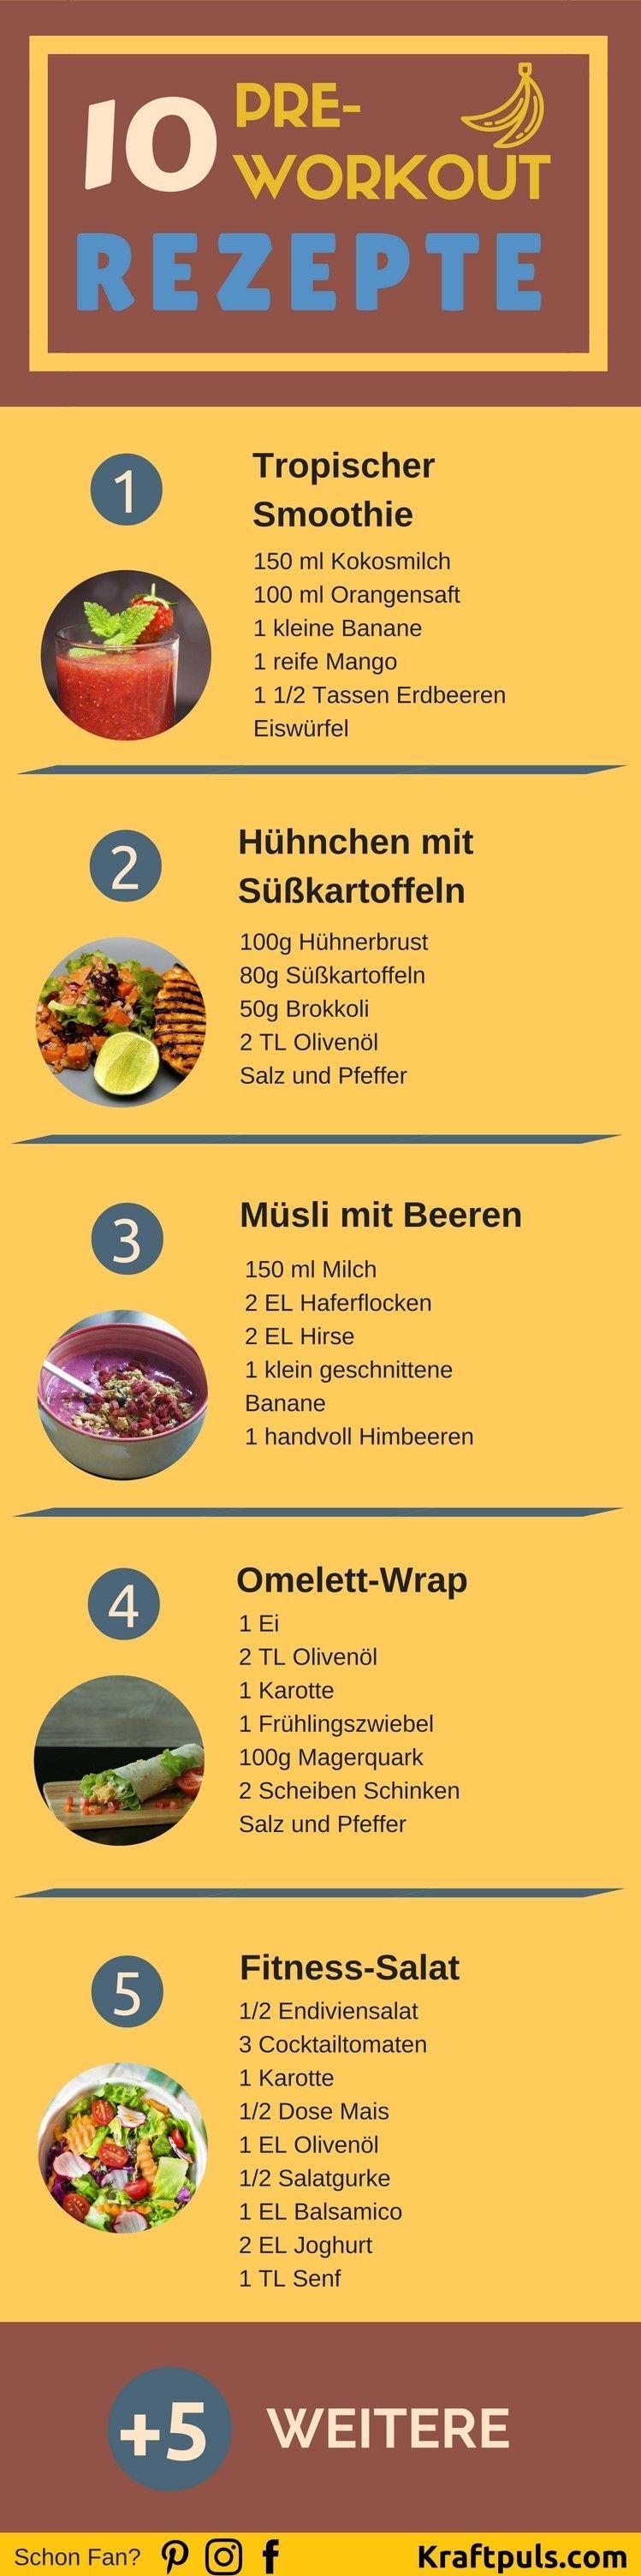 #ernährung #preworkout #training #ernhrung #richtige #optimale #fitness #deutsch #rezepte #sport #es...